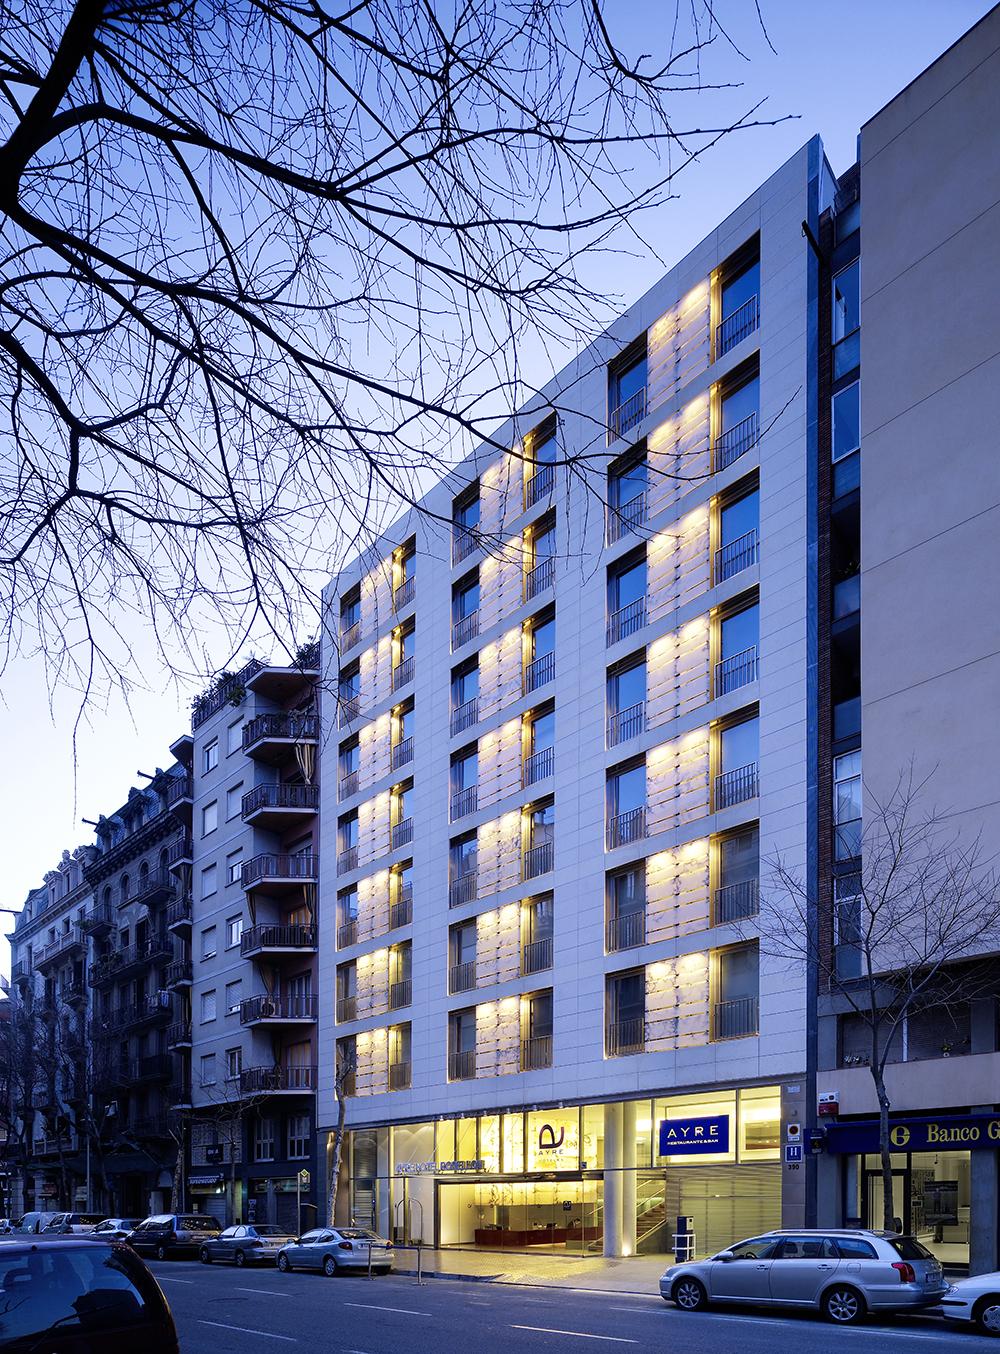 Hotel Ayre Barcelona